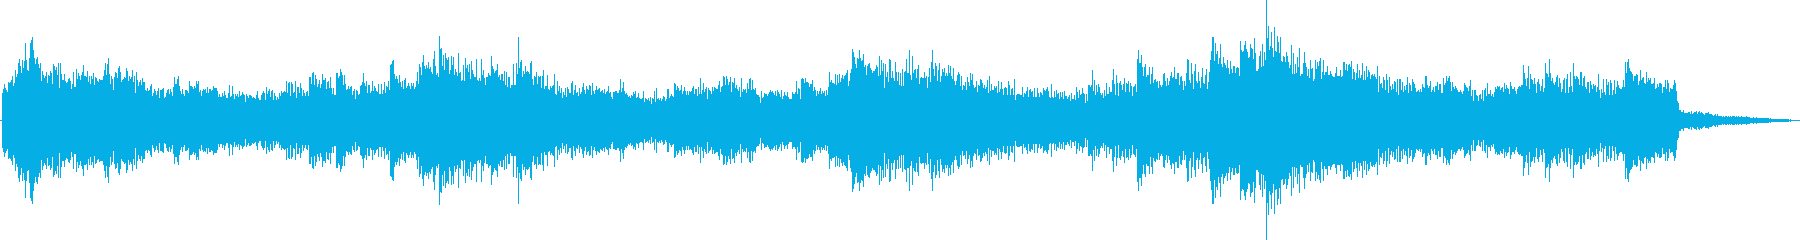 Beautiful and fantastic healing jingle's reproduced waveform